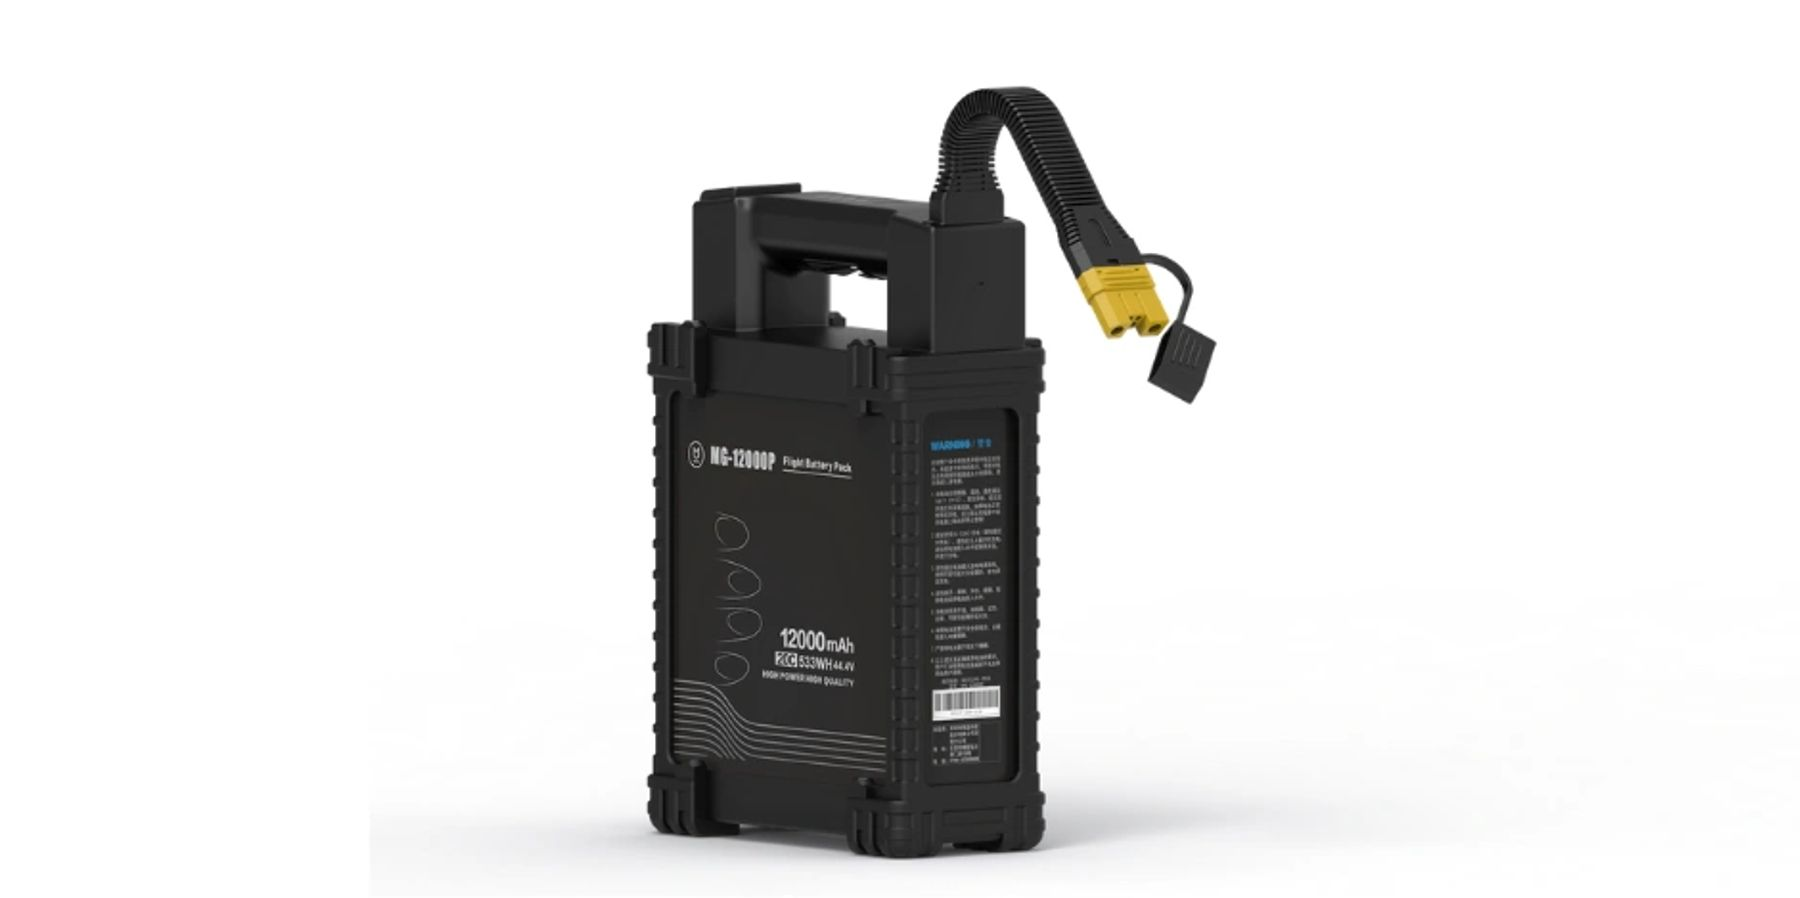 DJI Agras MG-1P Battery 12000P.jpg